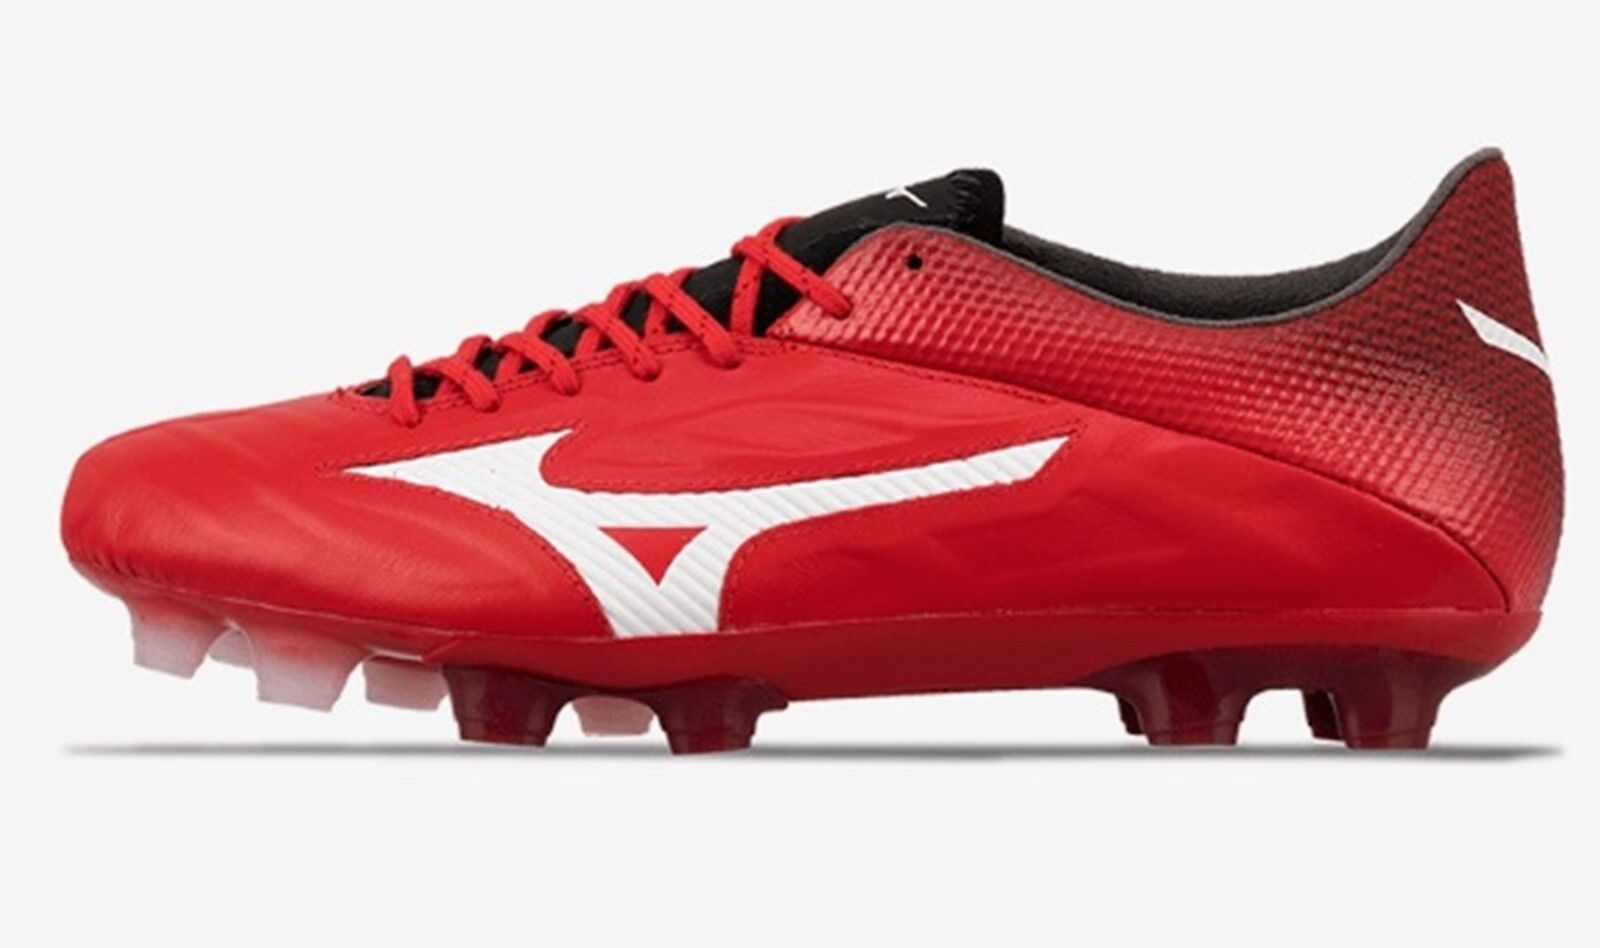 Mizuno Men Rebula V1 MD Cleats ROT Weiß Weiß ROT Soccer Football Schuhes Spike P1GA187162 0b6456